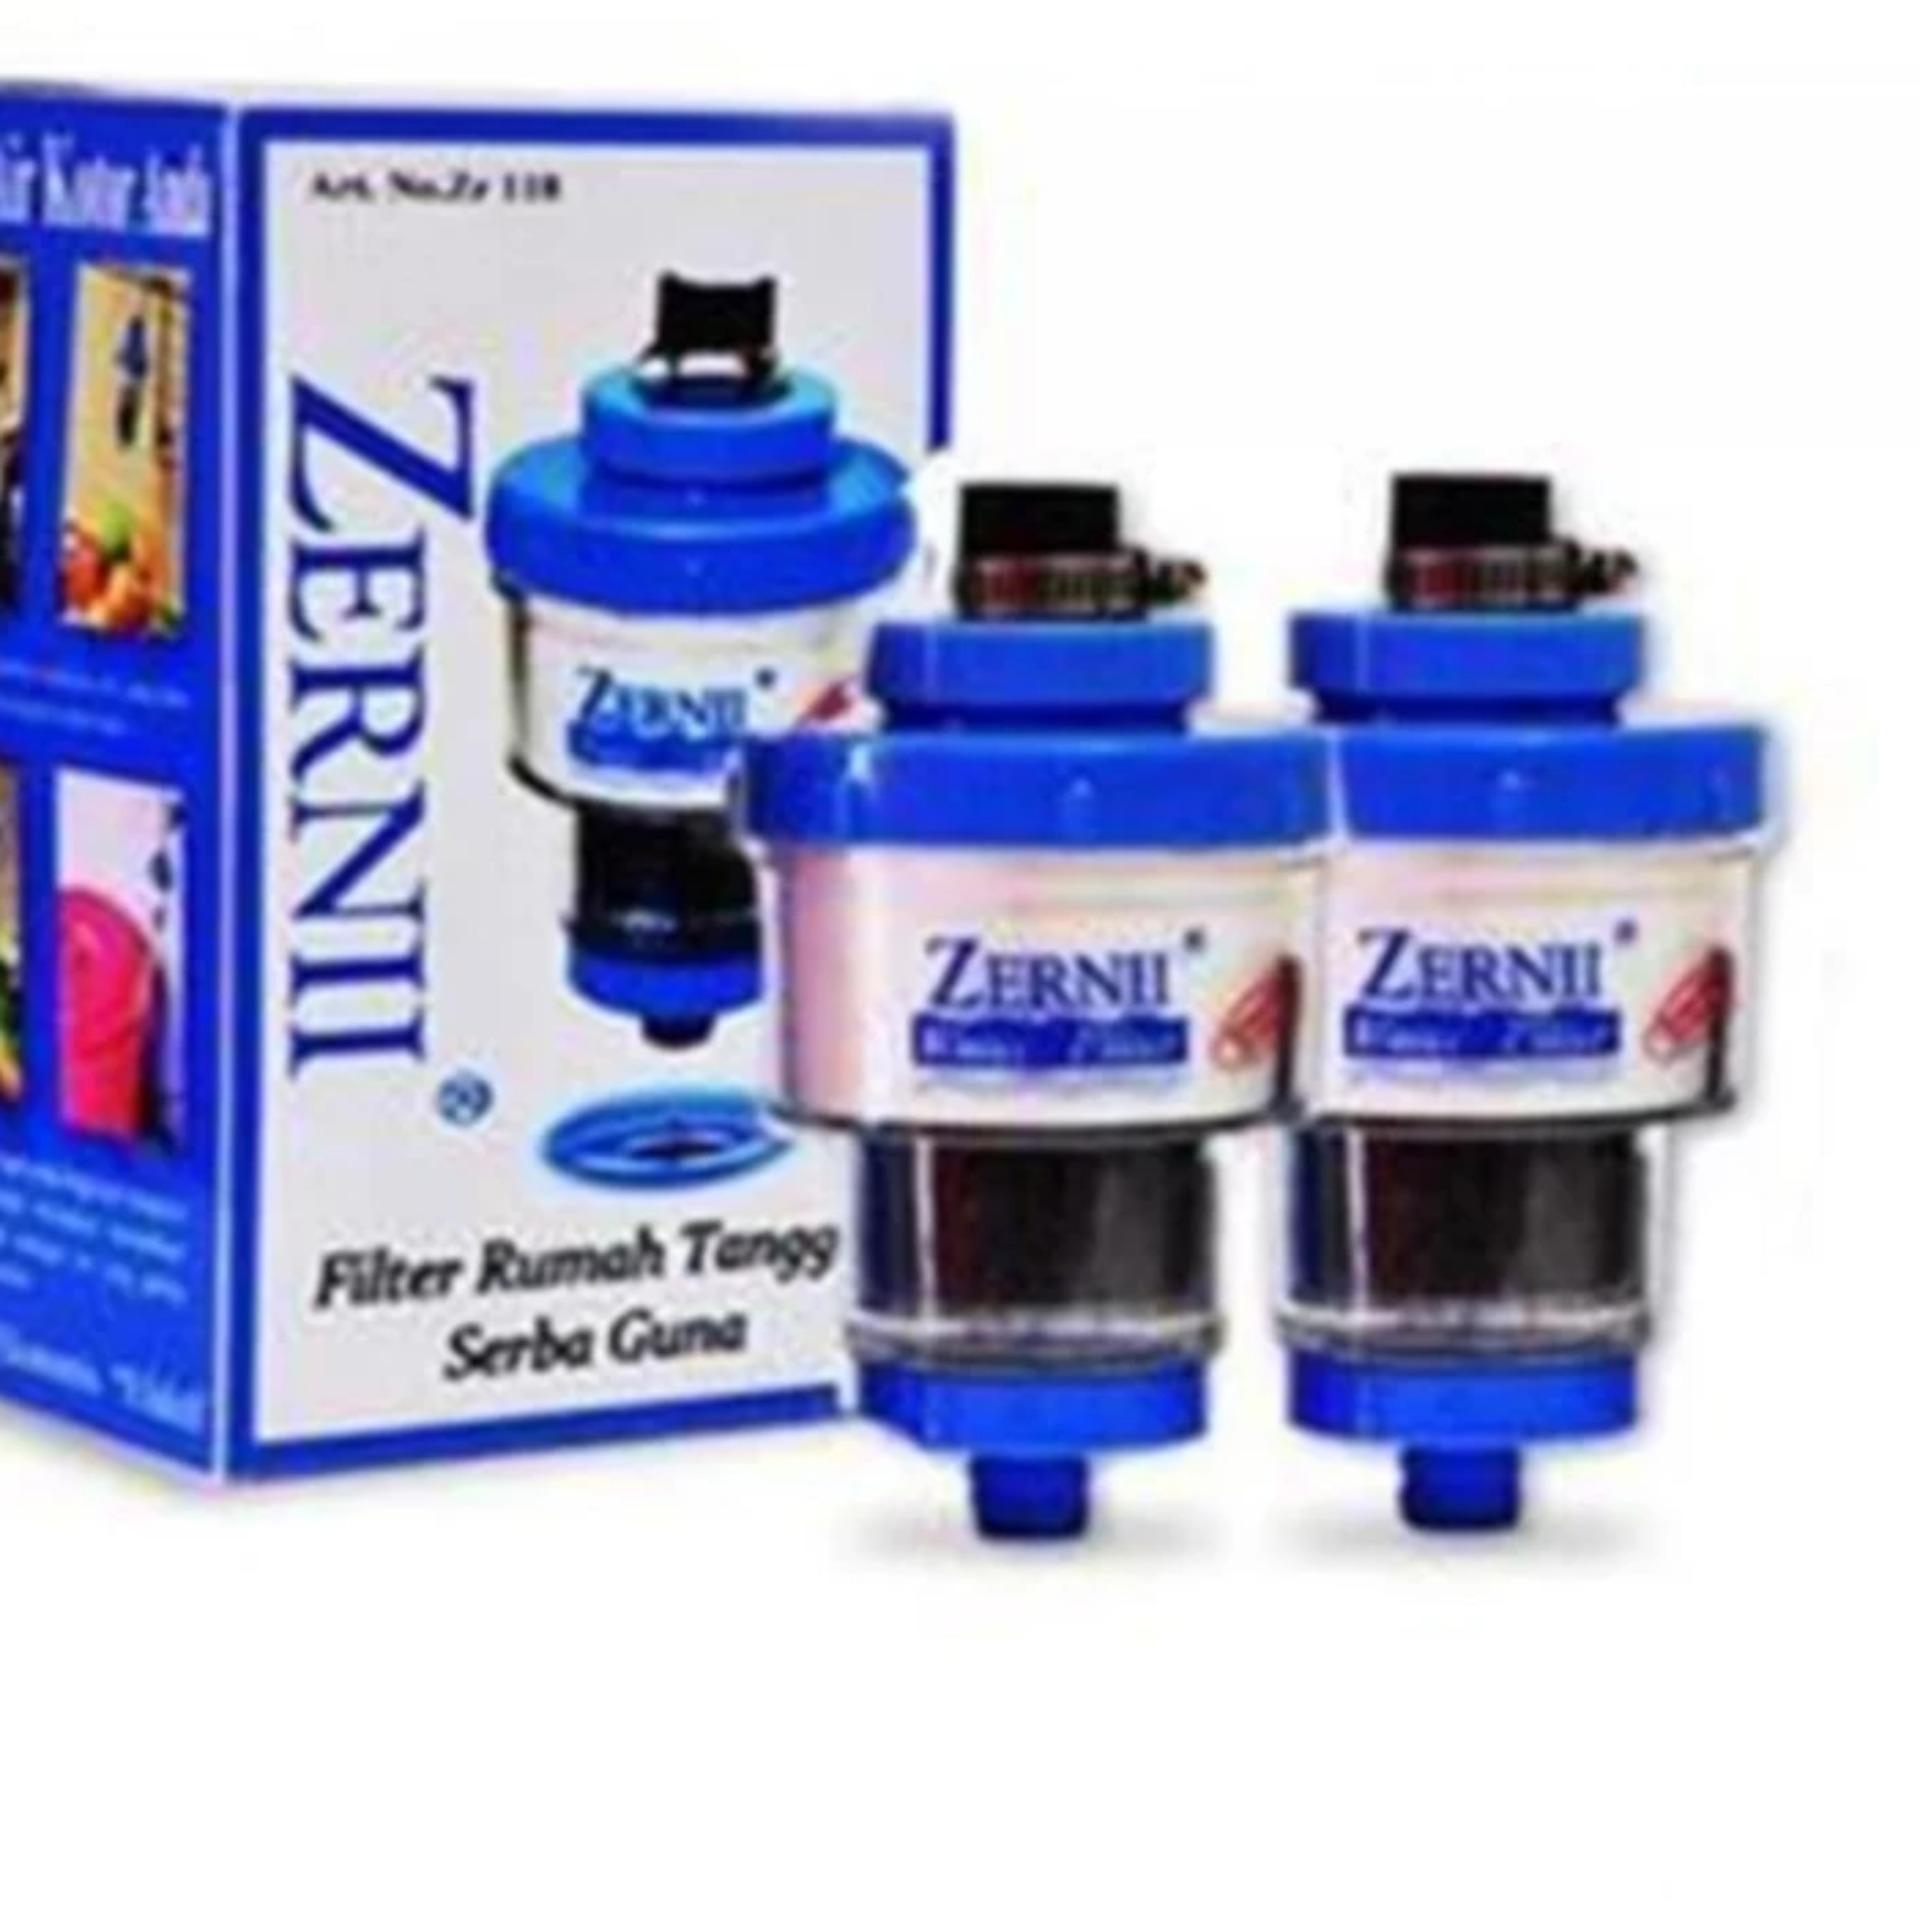 Bandingkan Toko 2pcs Filter Keran Air Zerni / Filter Saringan Air Zernii / Karbon Aktif Kran